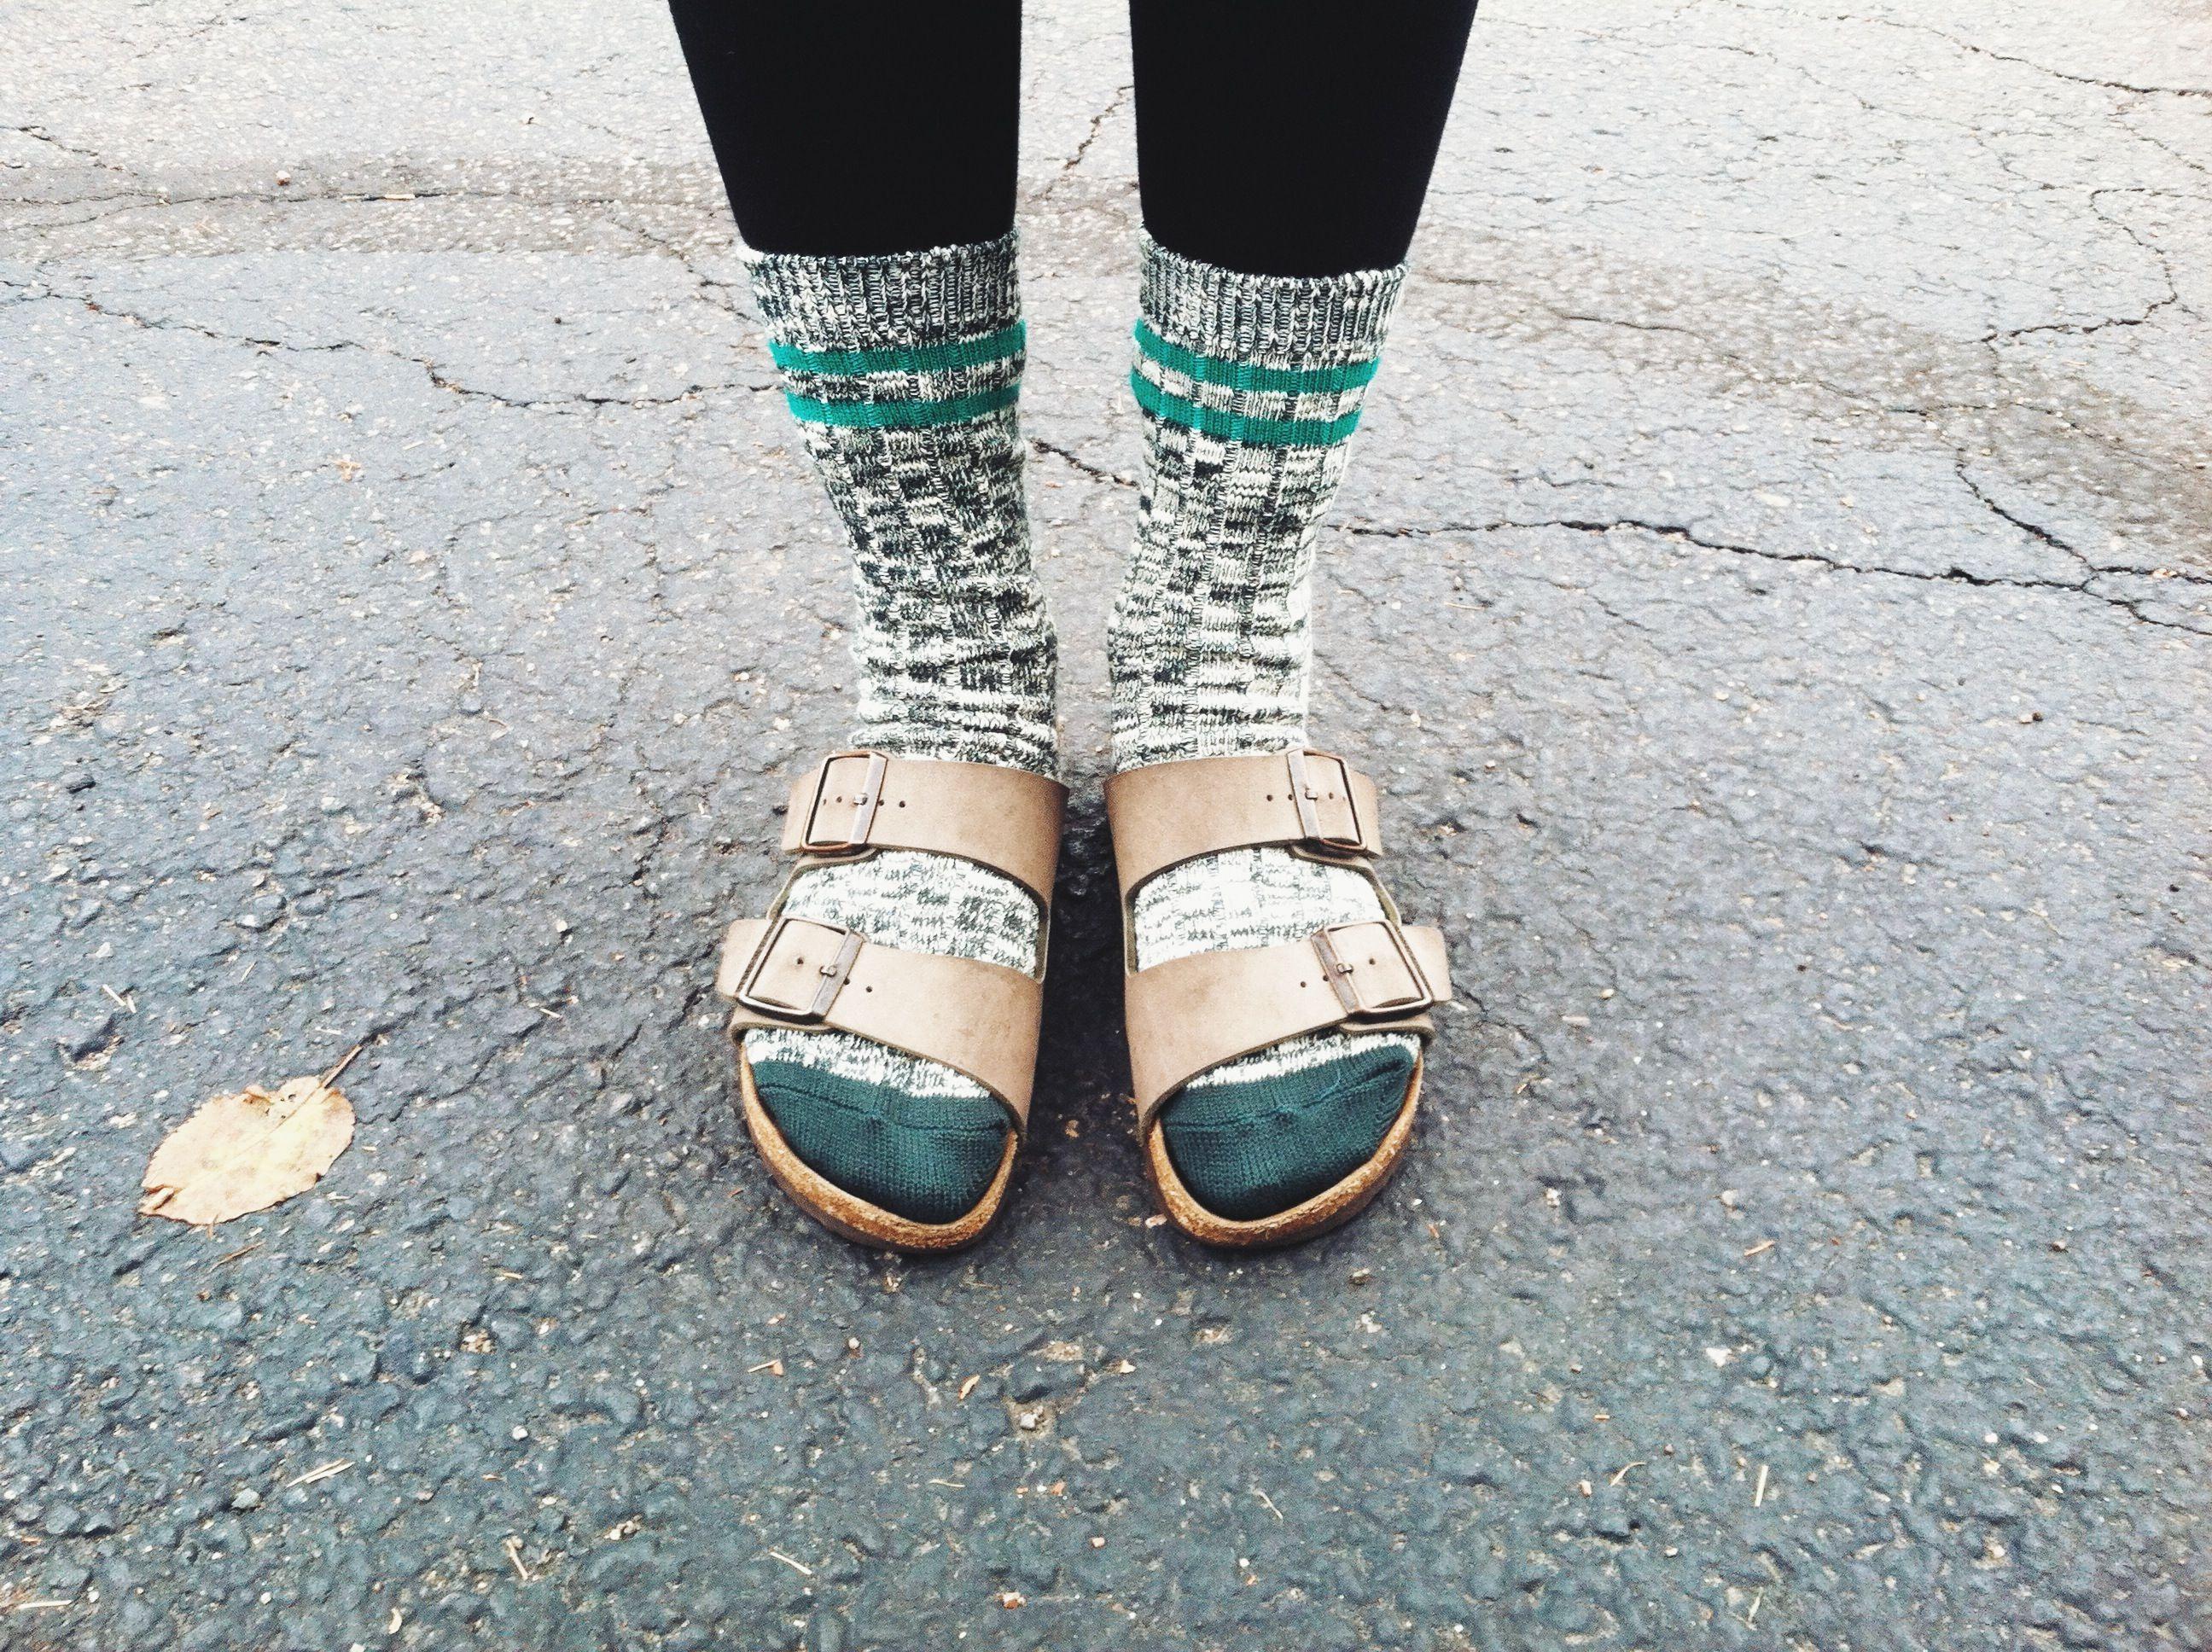 Birkenstocks and socks. I'm doin it. I am embracing the grandpa culture